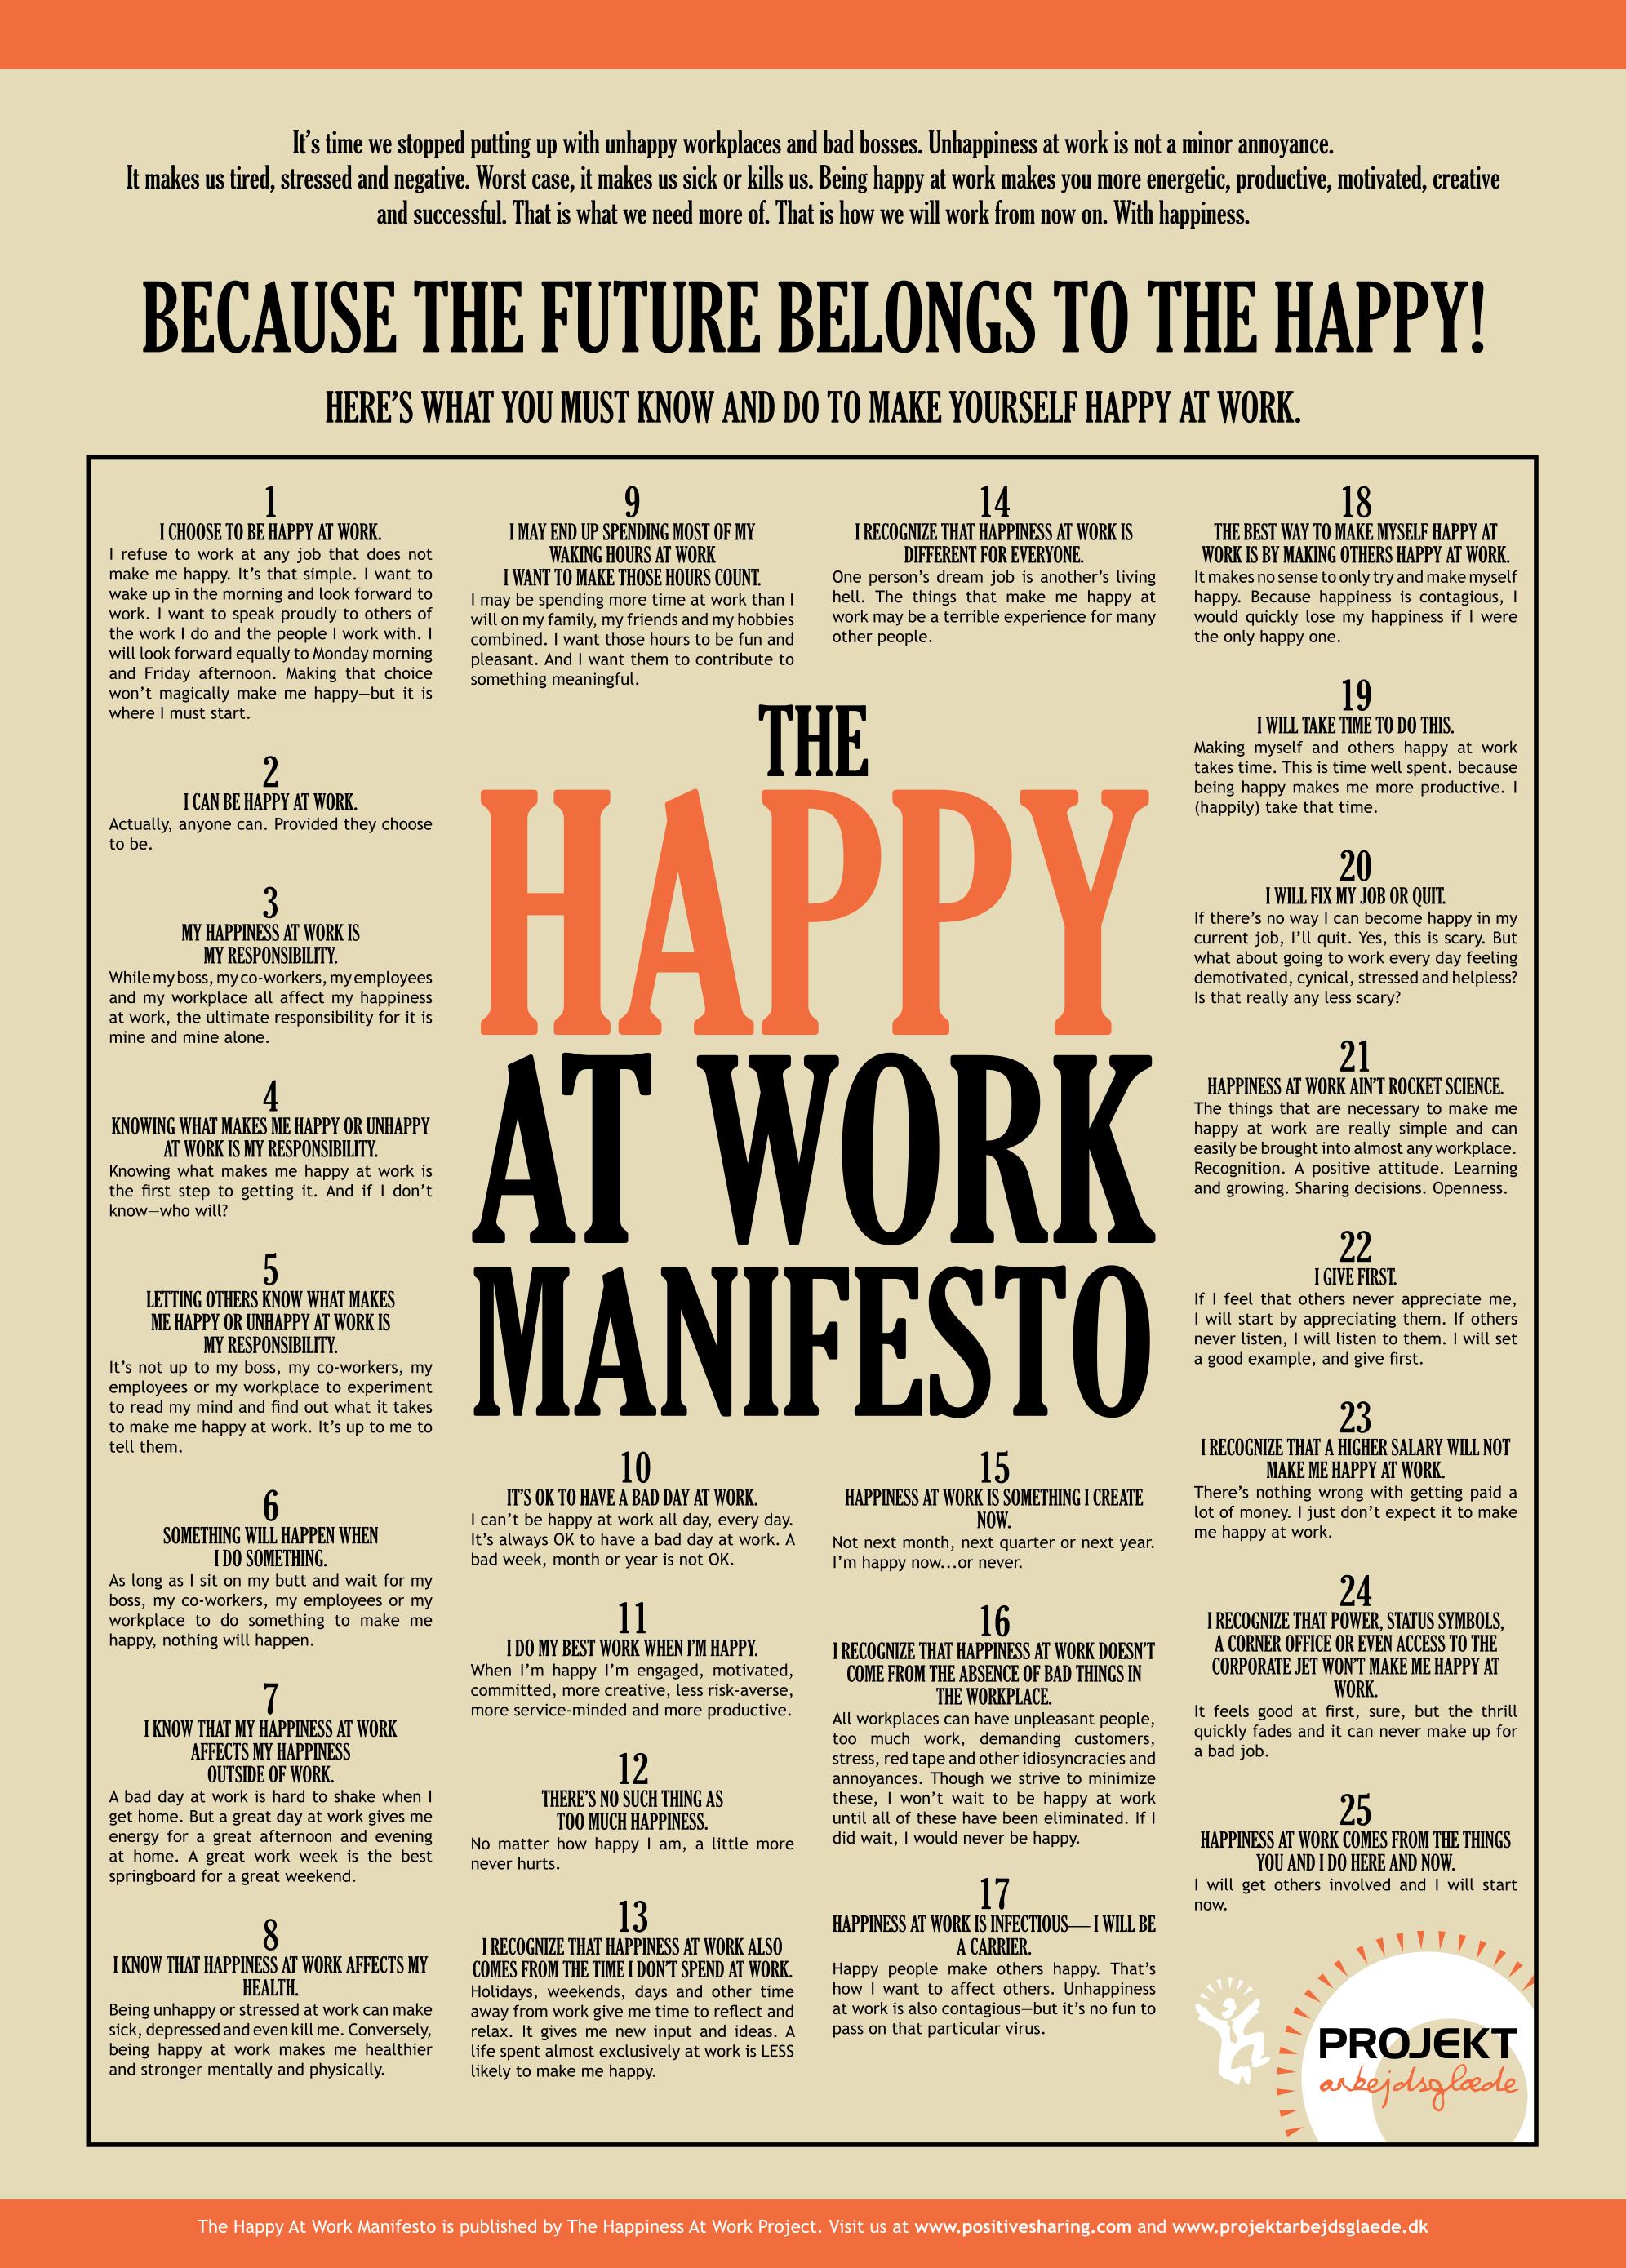 Happy at Work Manifesto | Employee Experience | Pinterest